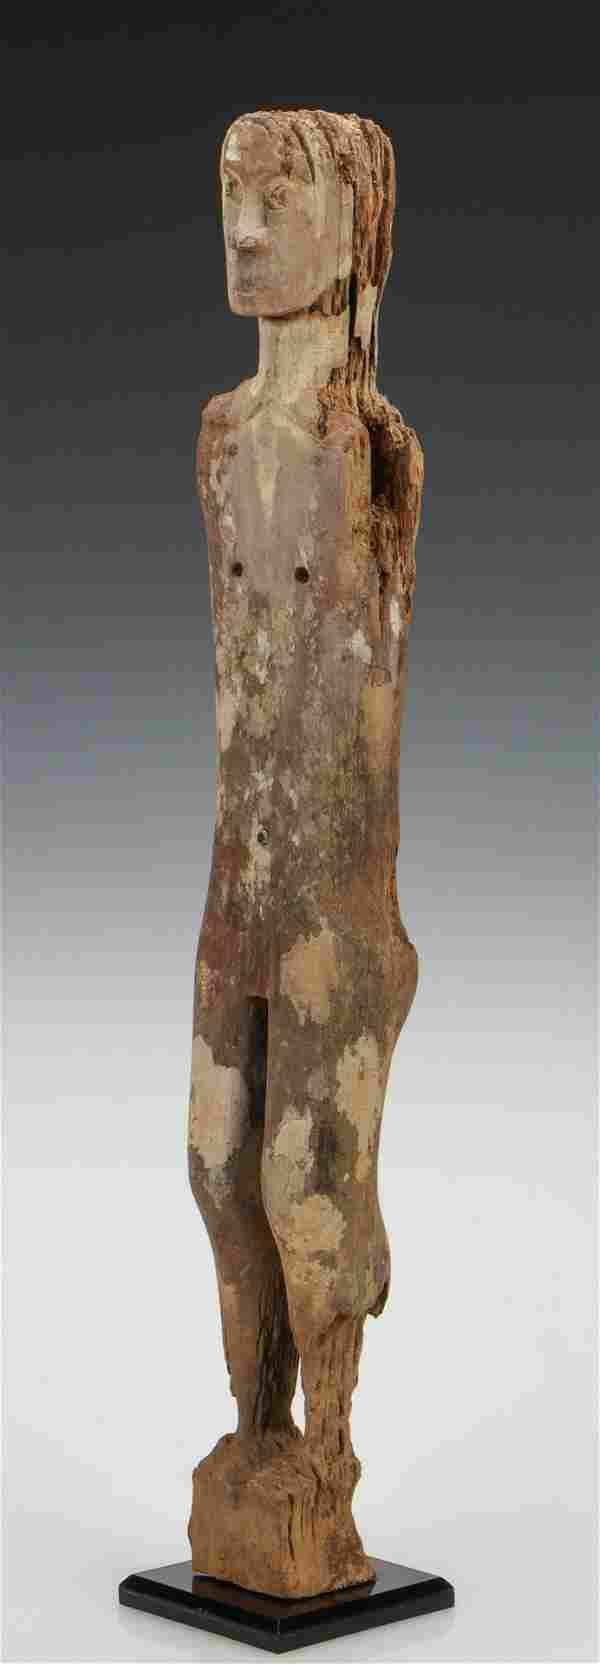 Antique Dayak Guardian Figure Hampatong, Borneo